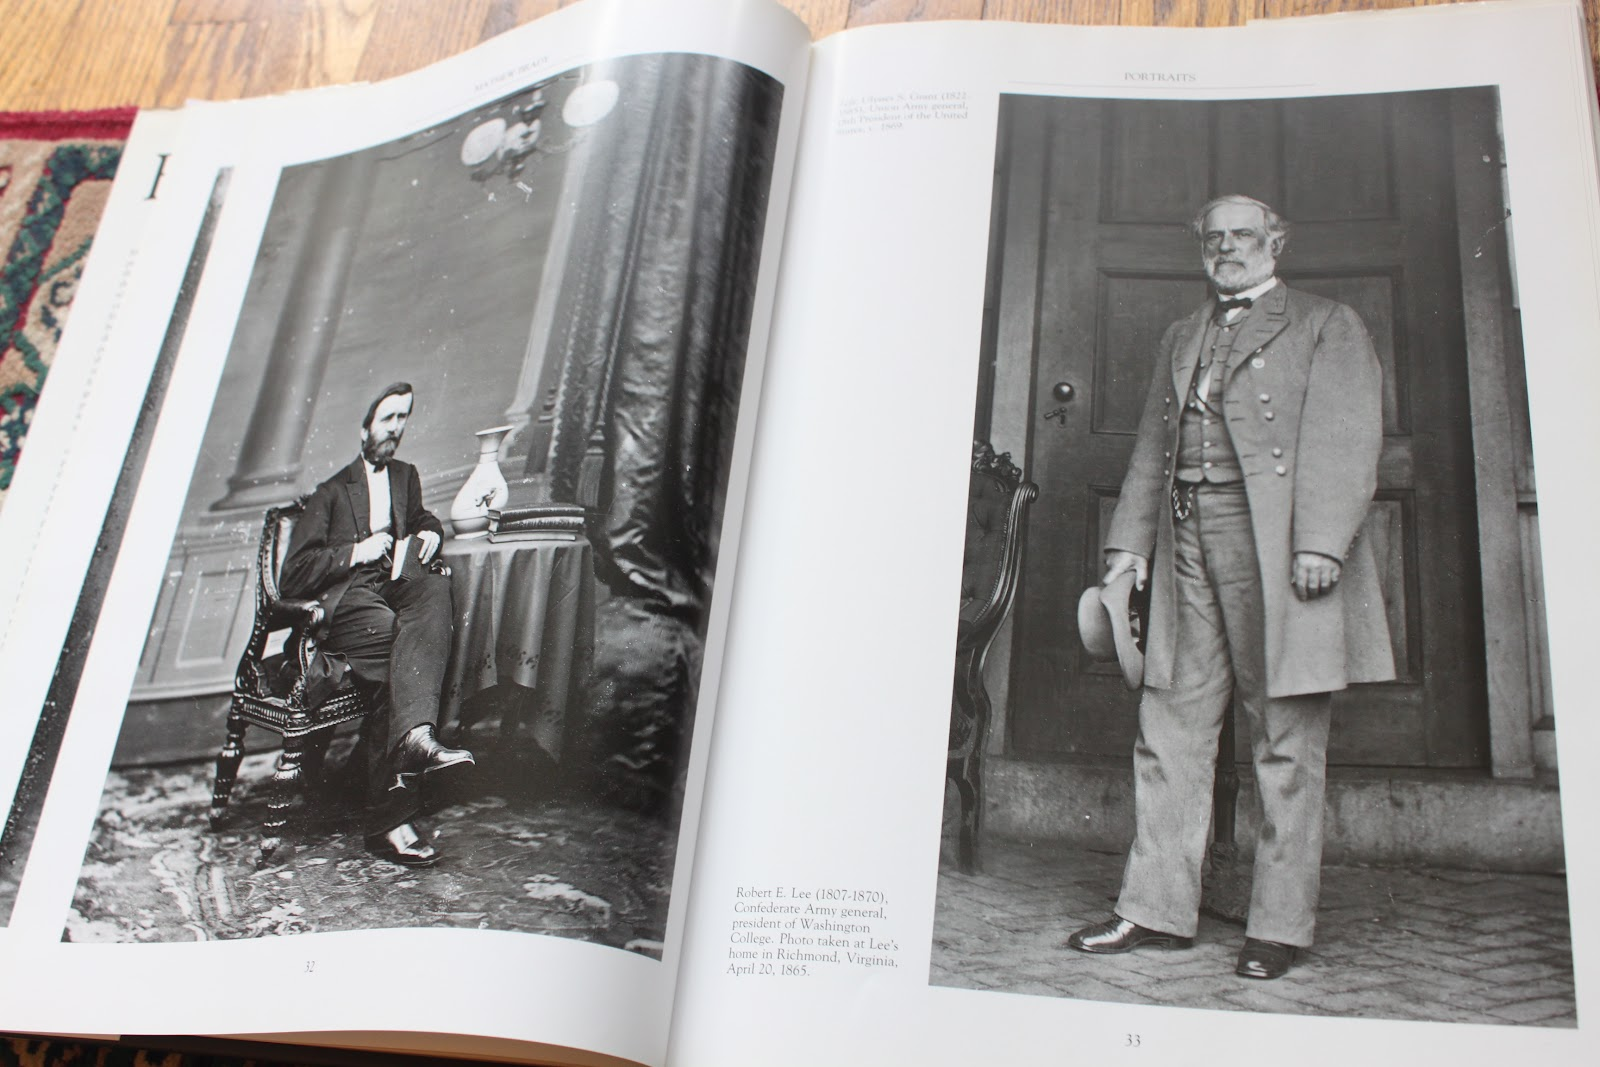 a biography of mathew b brady a civil war photographer Mathew brady: photographer of the civil war average rating author: pflueger, lynda series: historical american biographies publisher: varies, see individual.